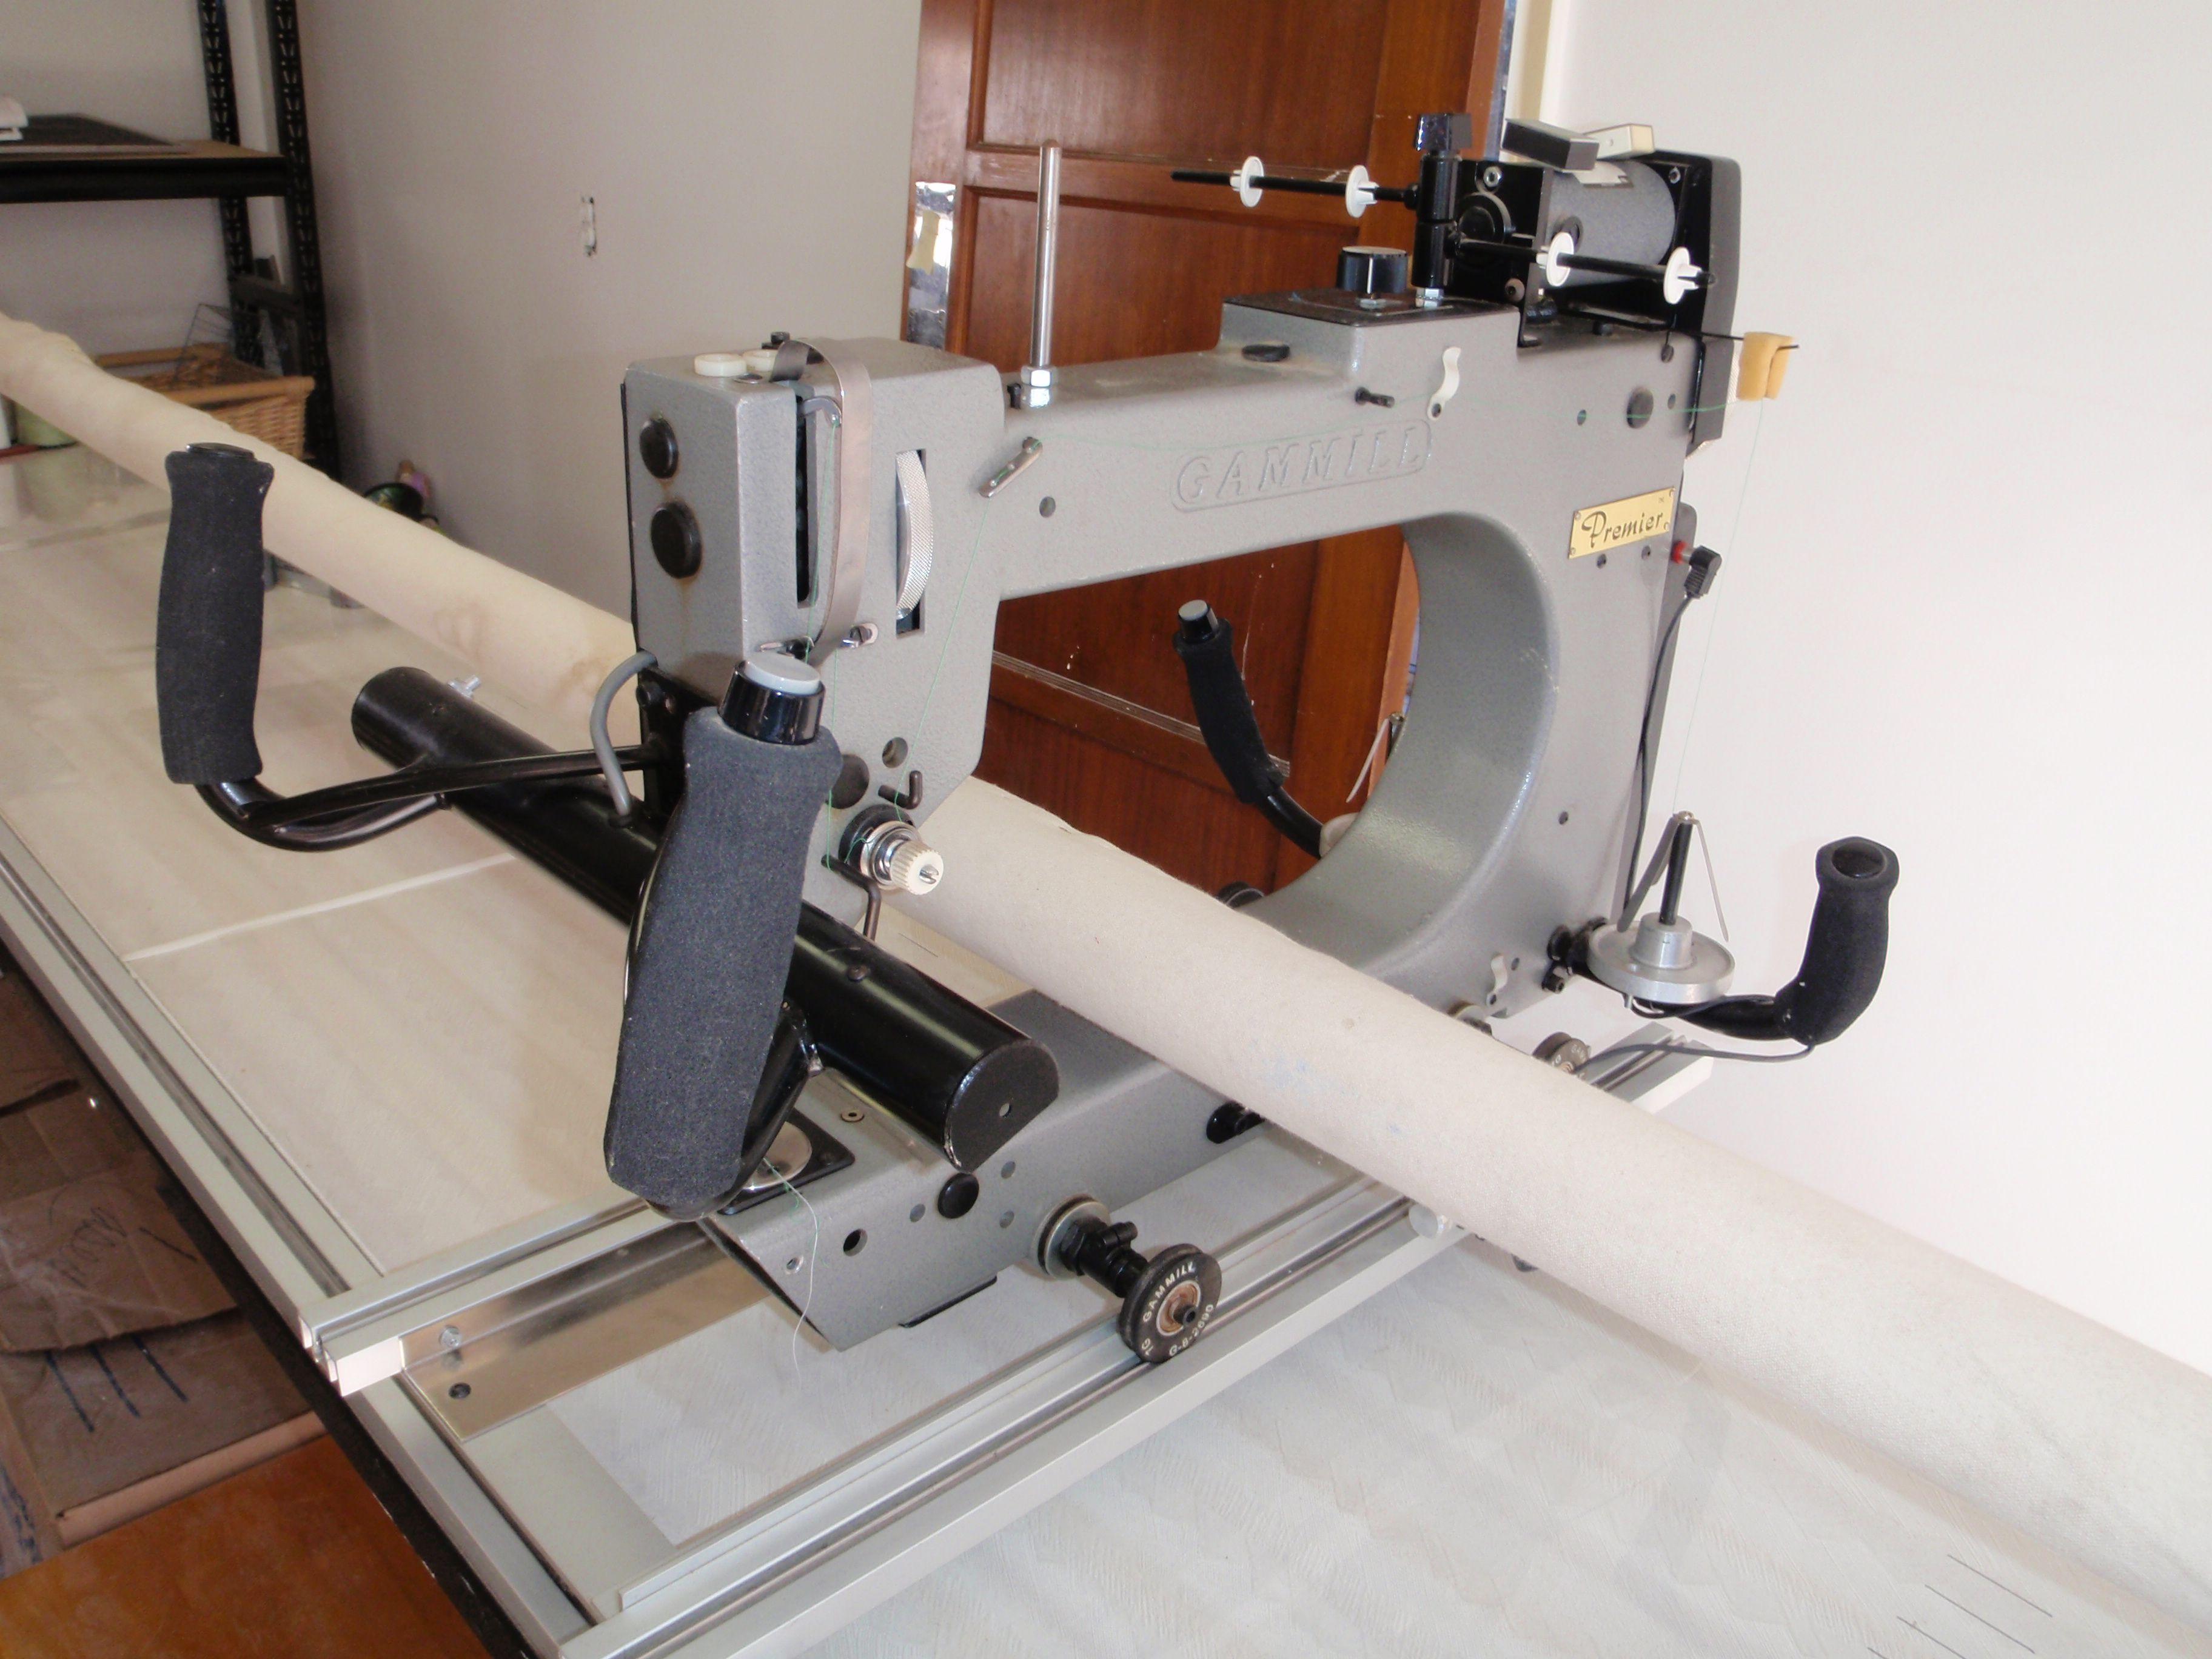 Gammill Premier 18-8 Mid arm quilting machine 12 foot table. http ... : affordable long arm quilting machines - Adamdwight.com